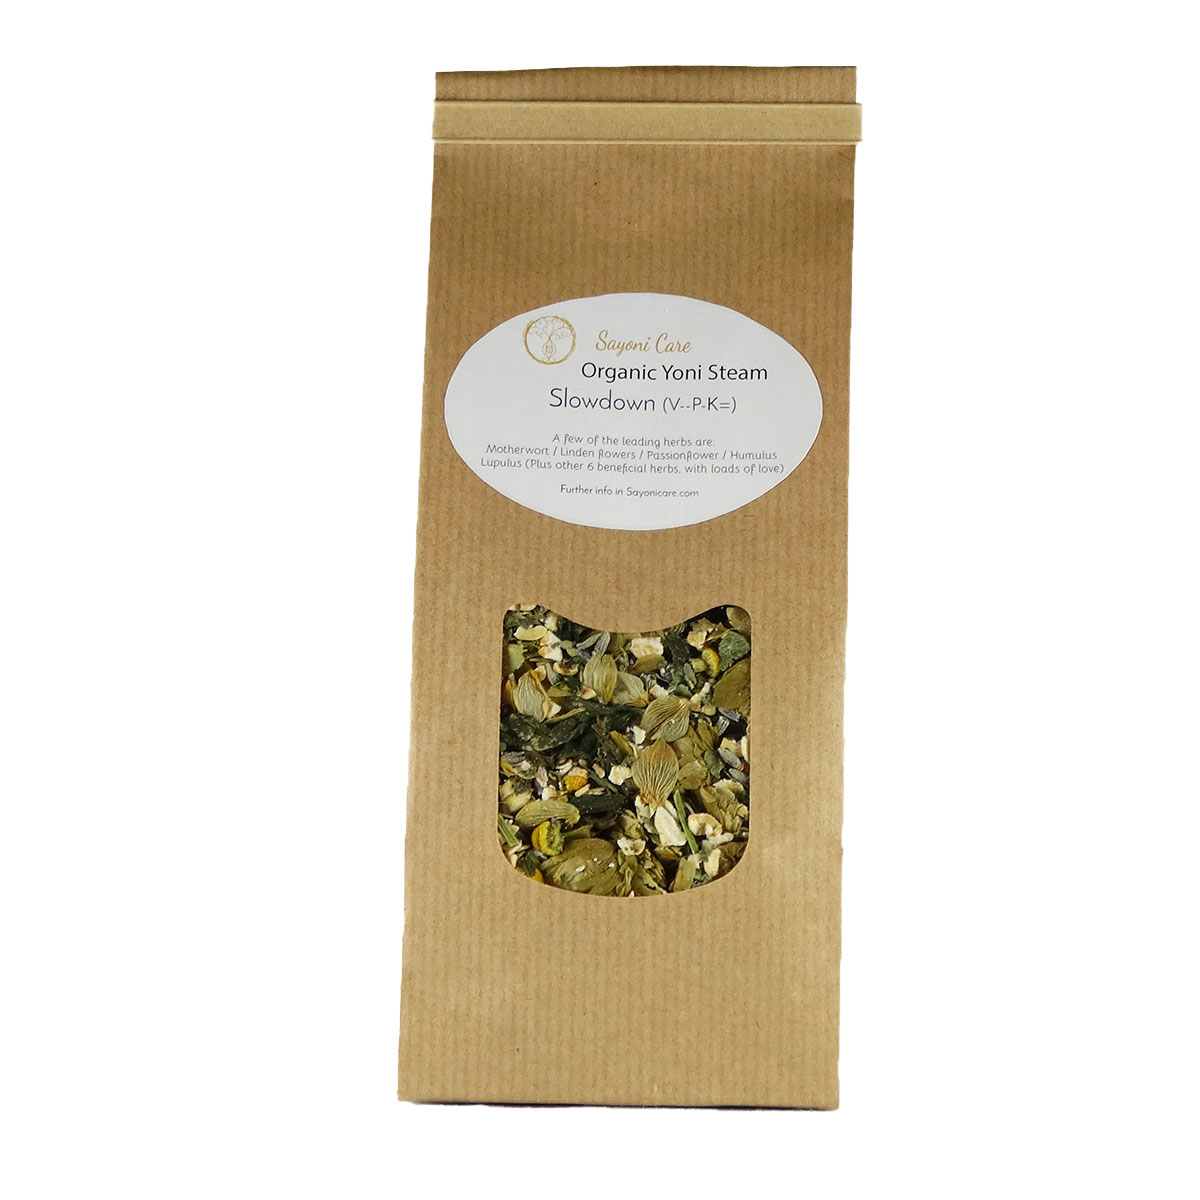 Slowdowon organic herbal vaginal steam - Sayoni Care